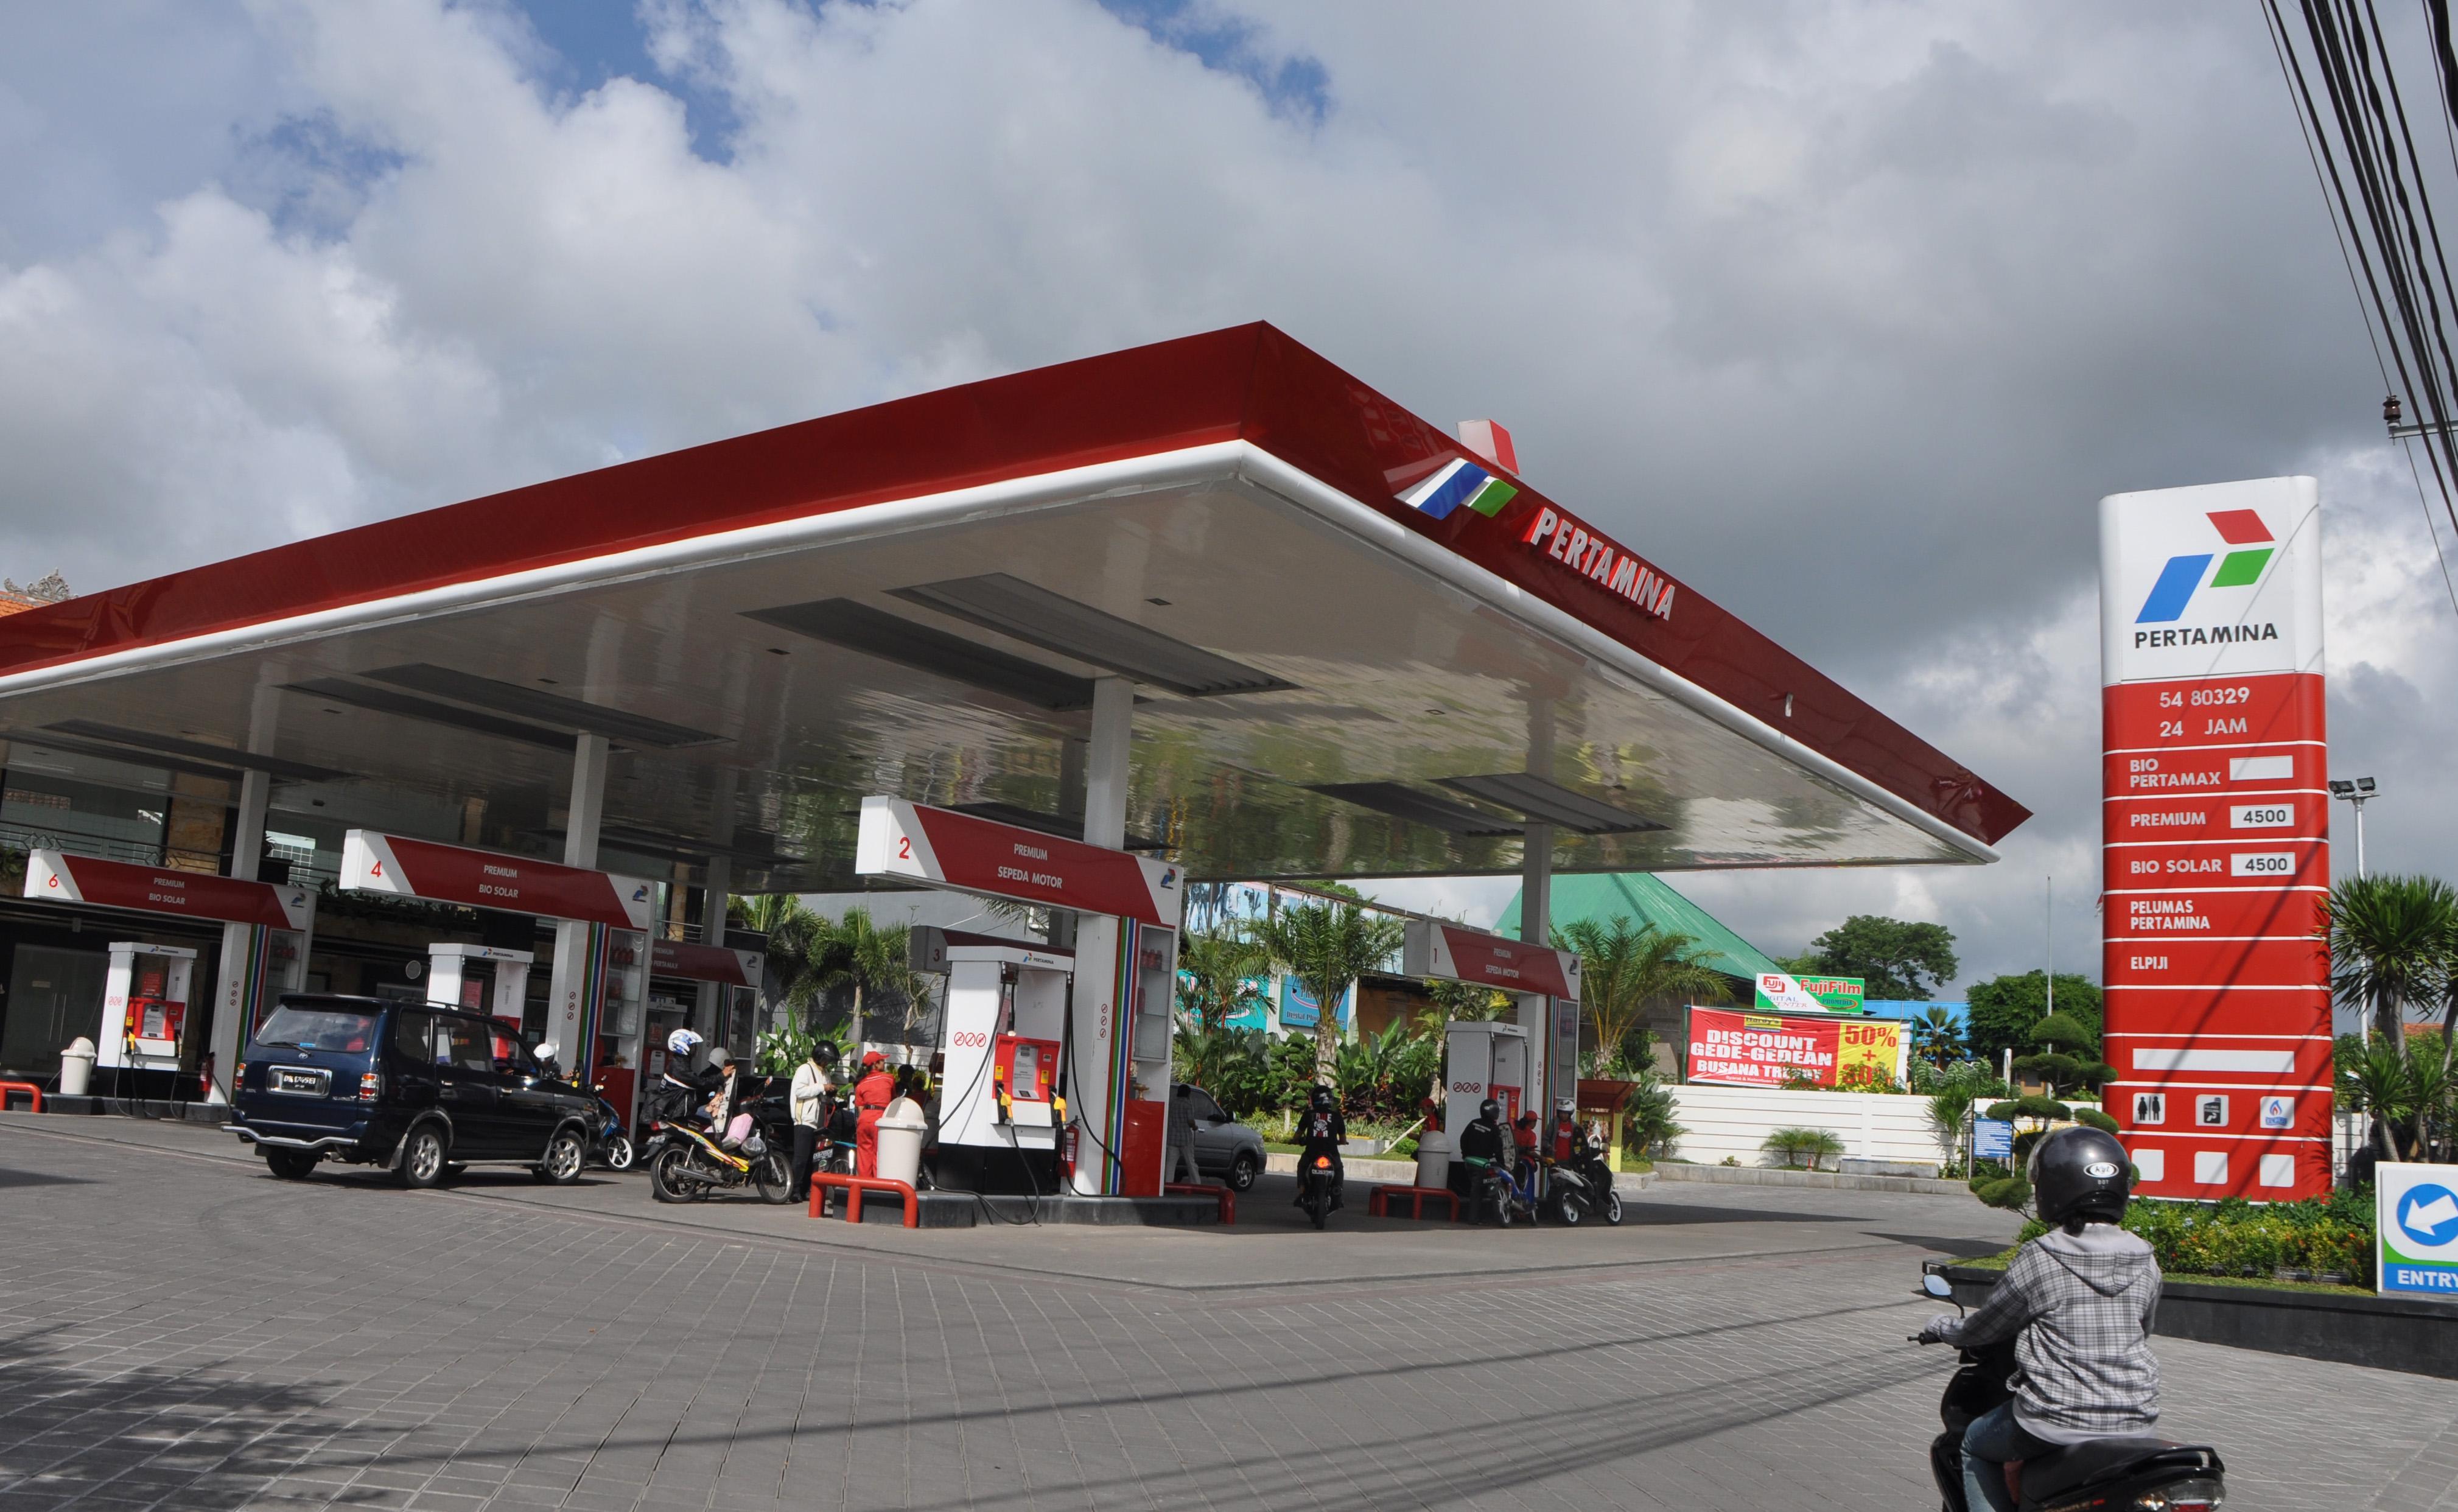 Filepertamina filling station bali indonesiag wikimedia filepertamina filling station bali indonesiag pronofoot35fo Gallery